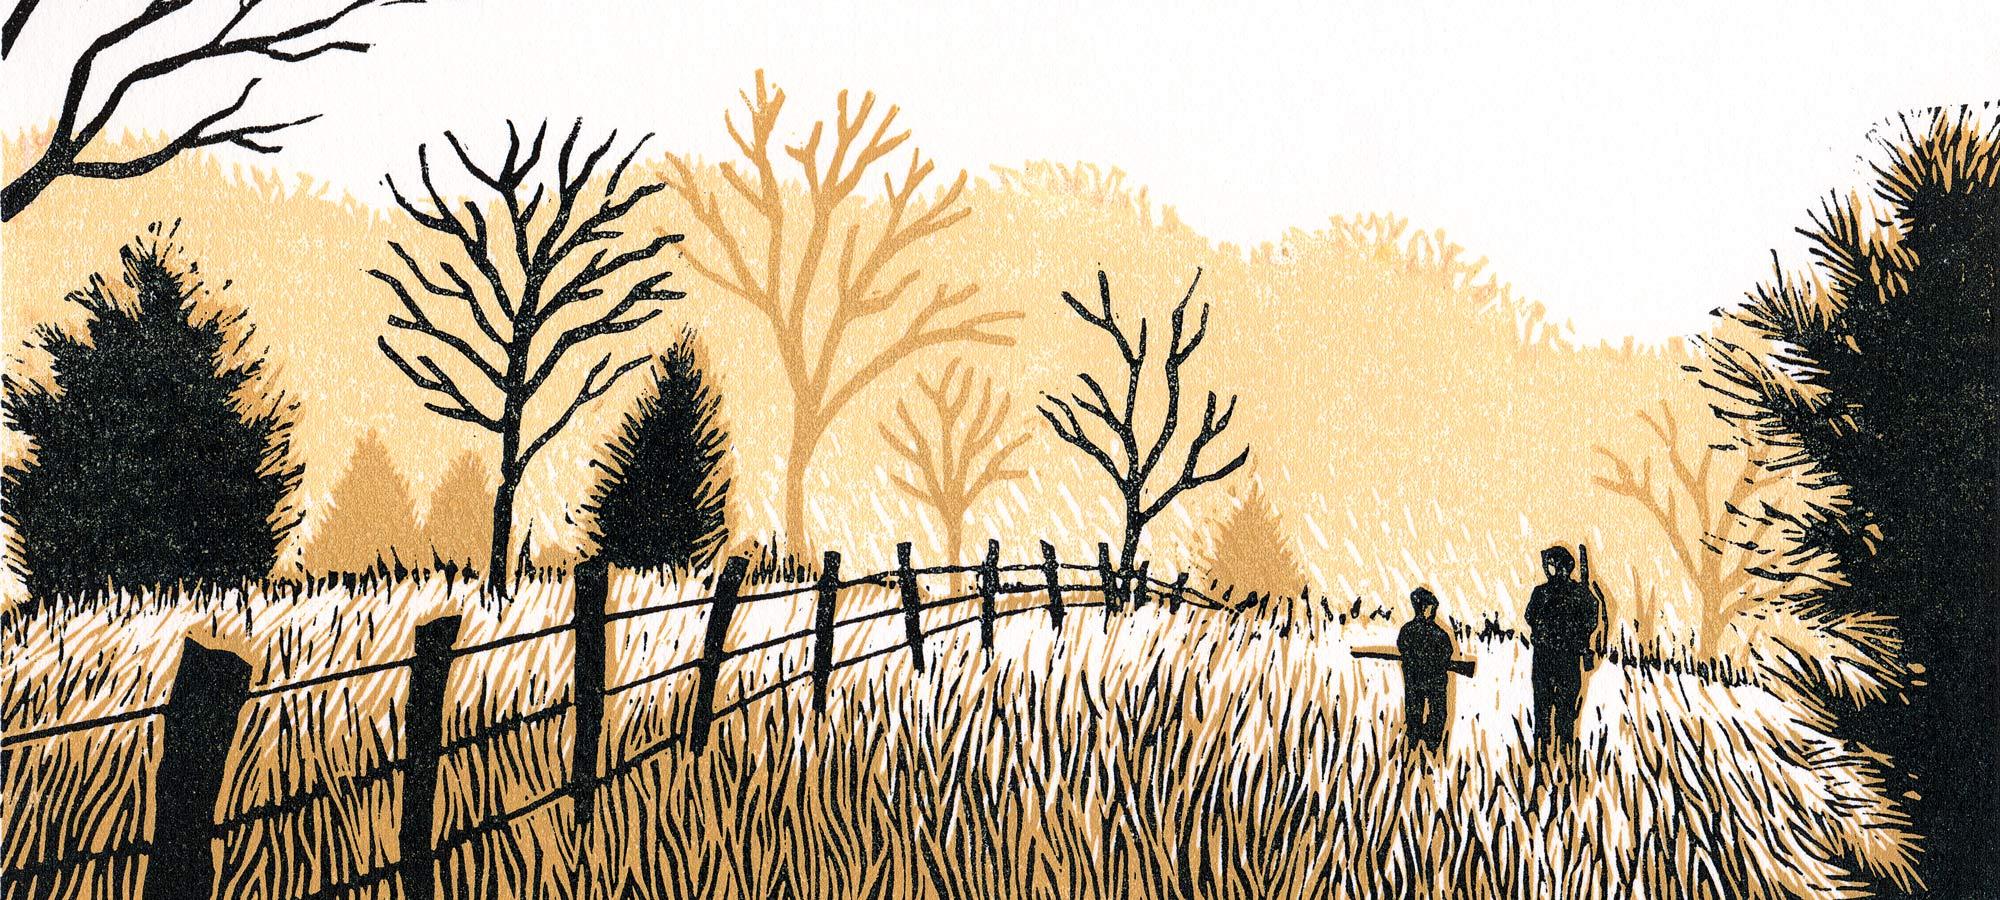 Buck hunting illustration